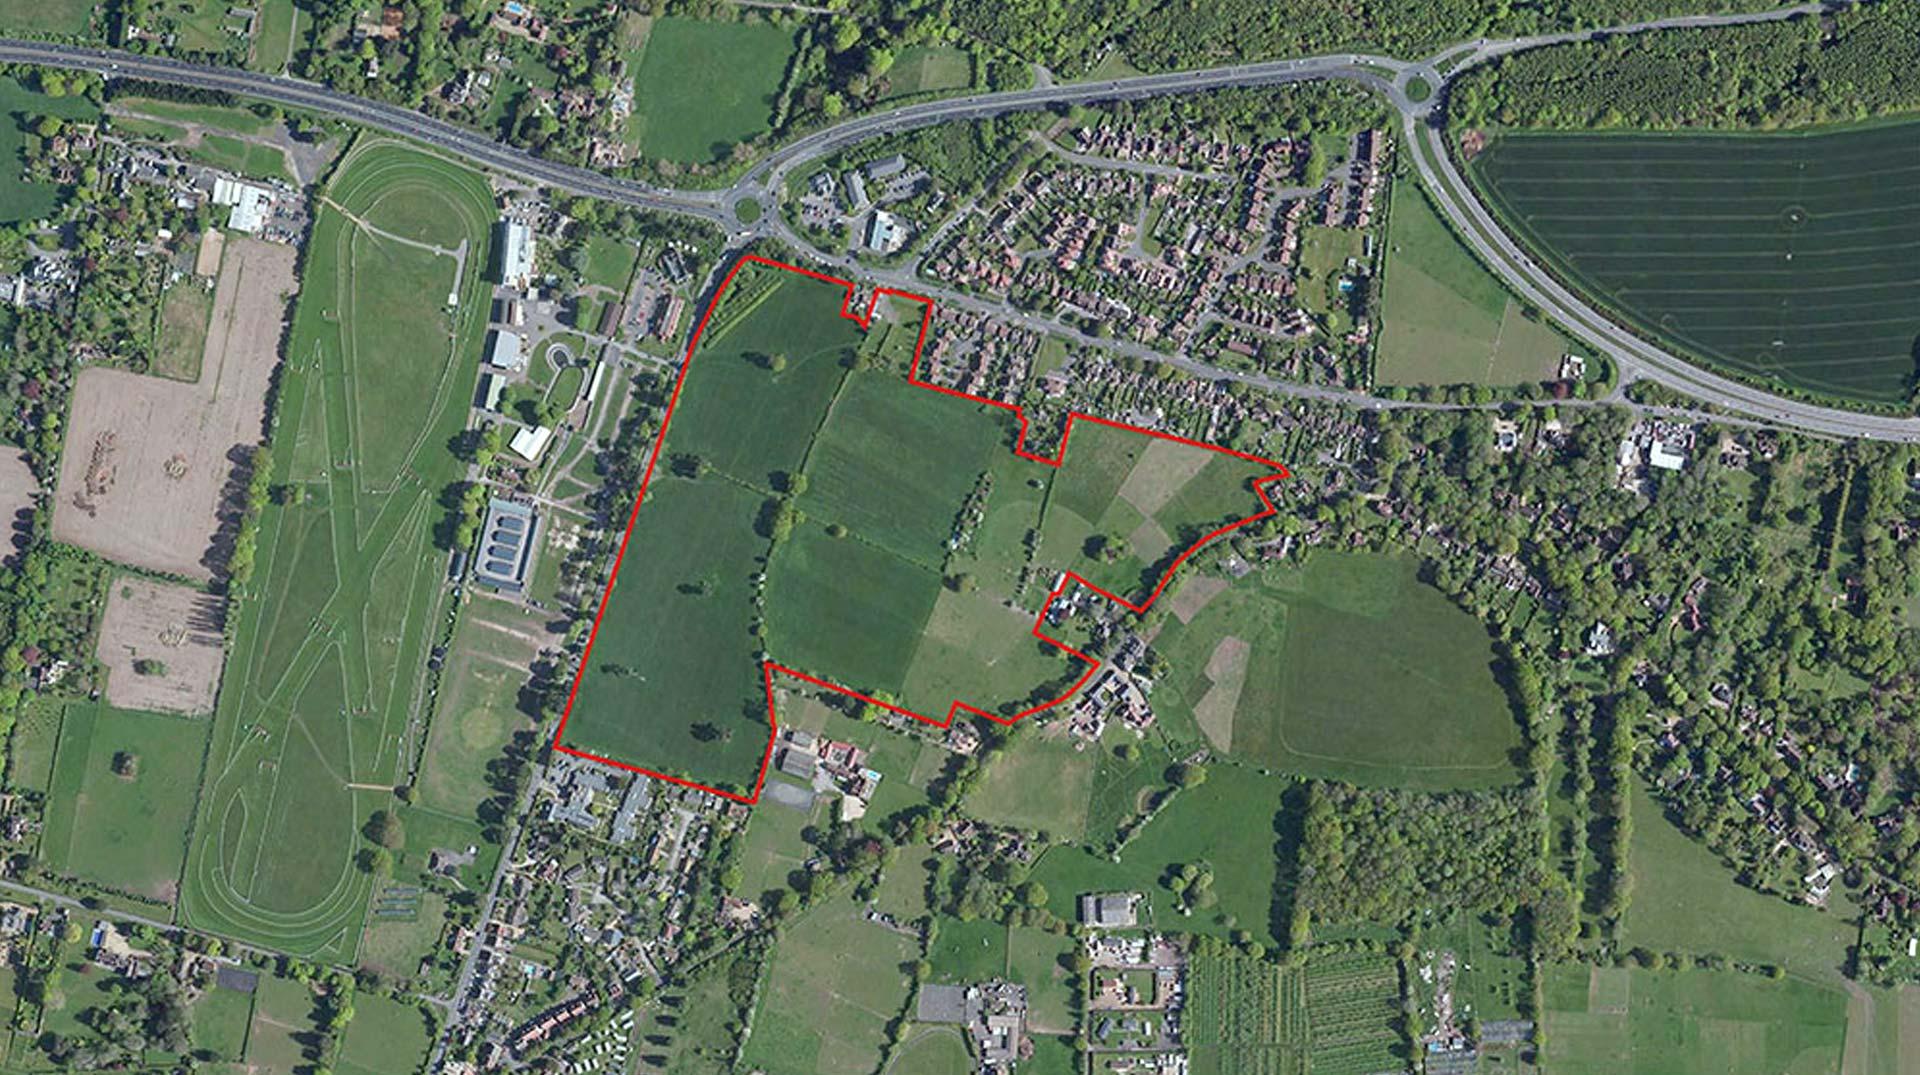 Fontwell - Dandara Strategic Land Project